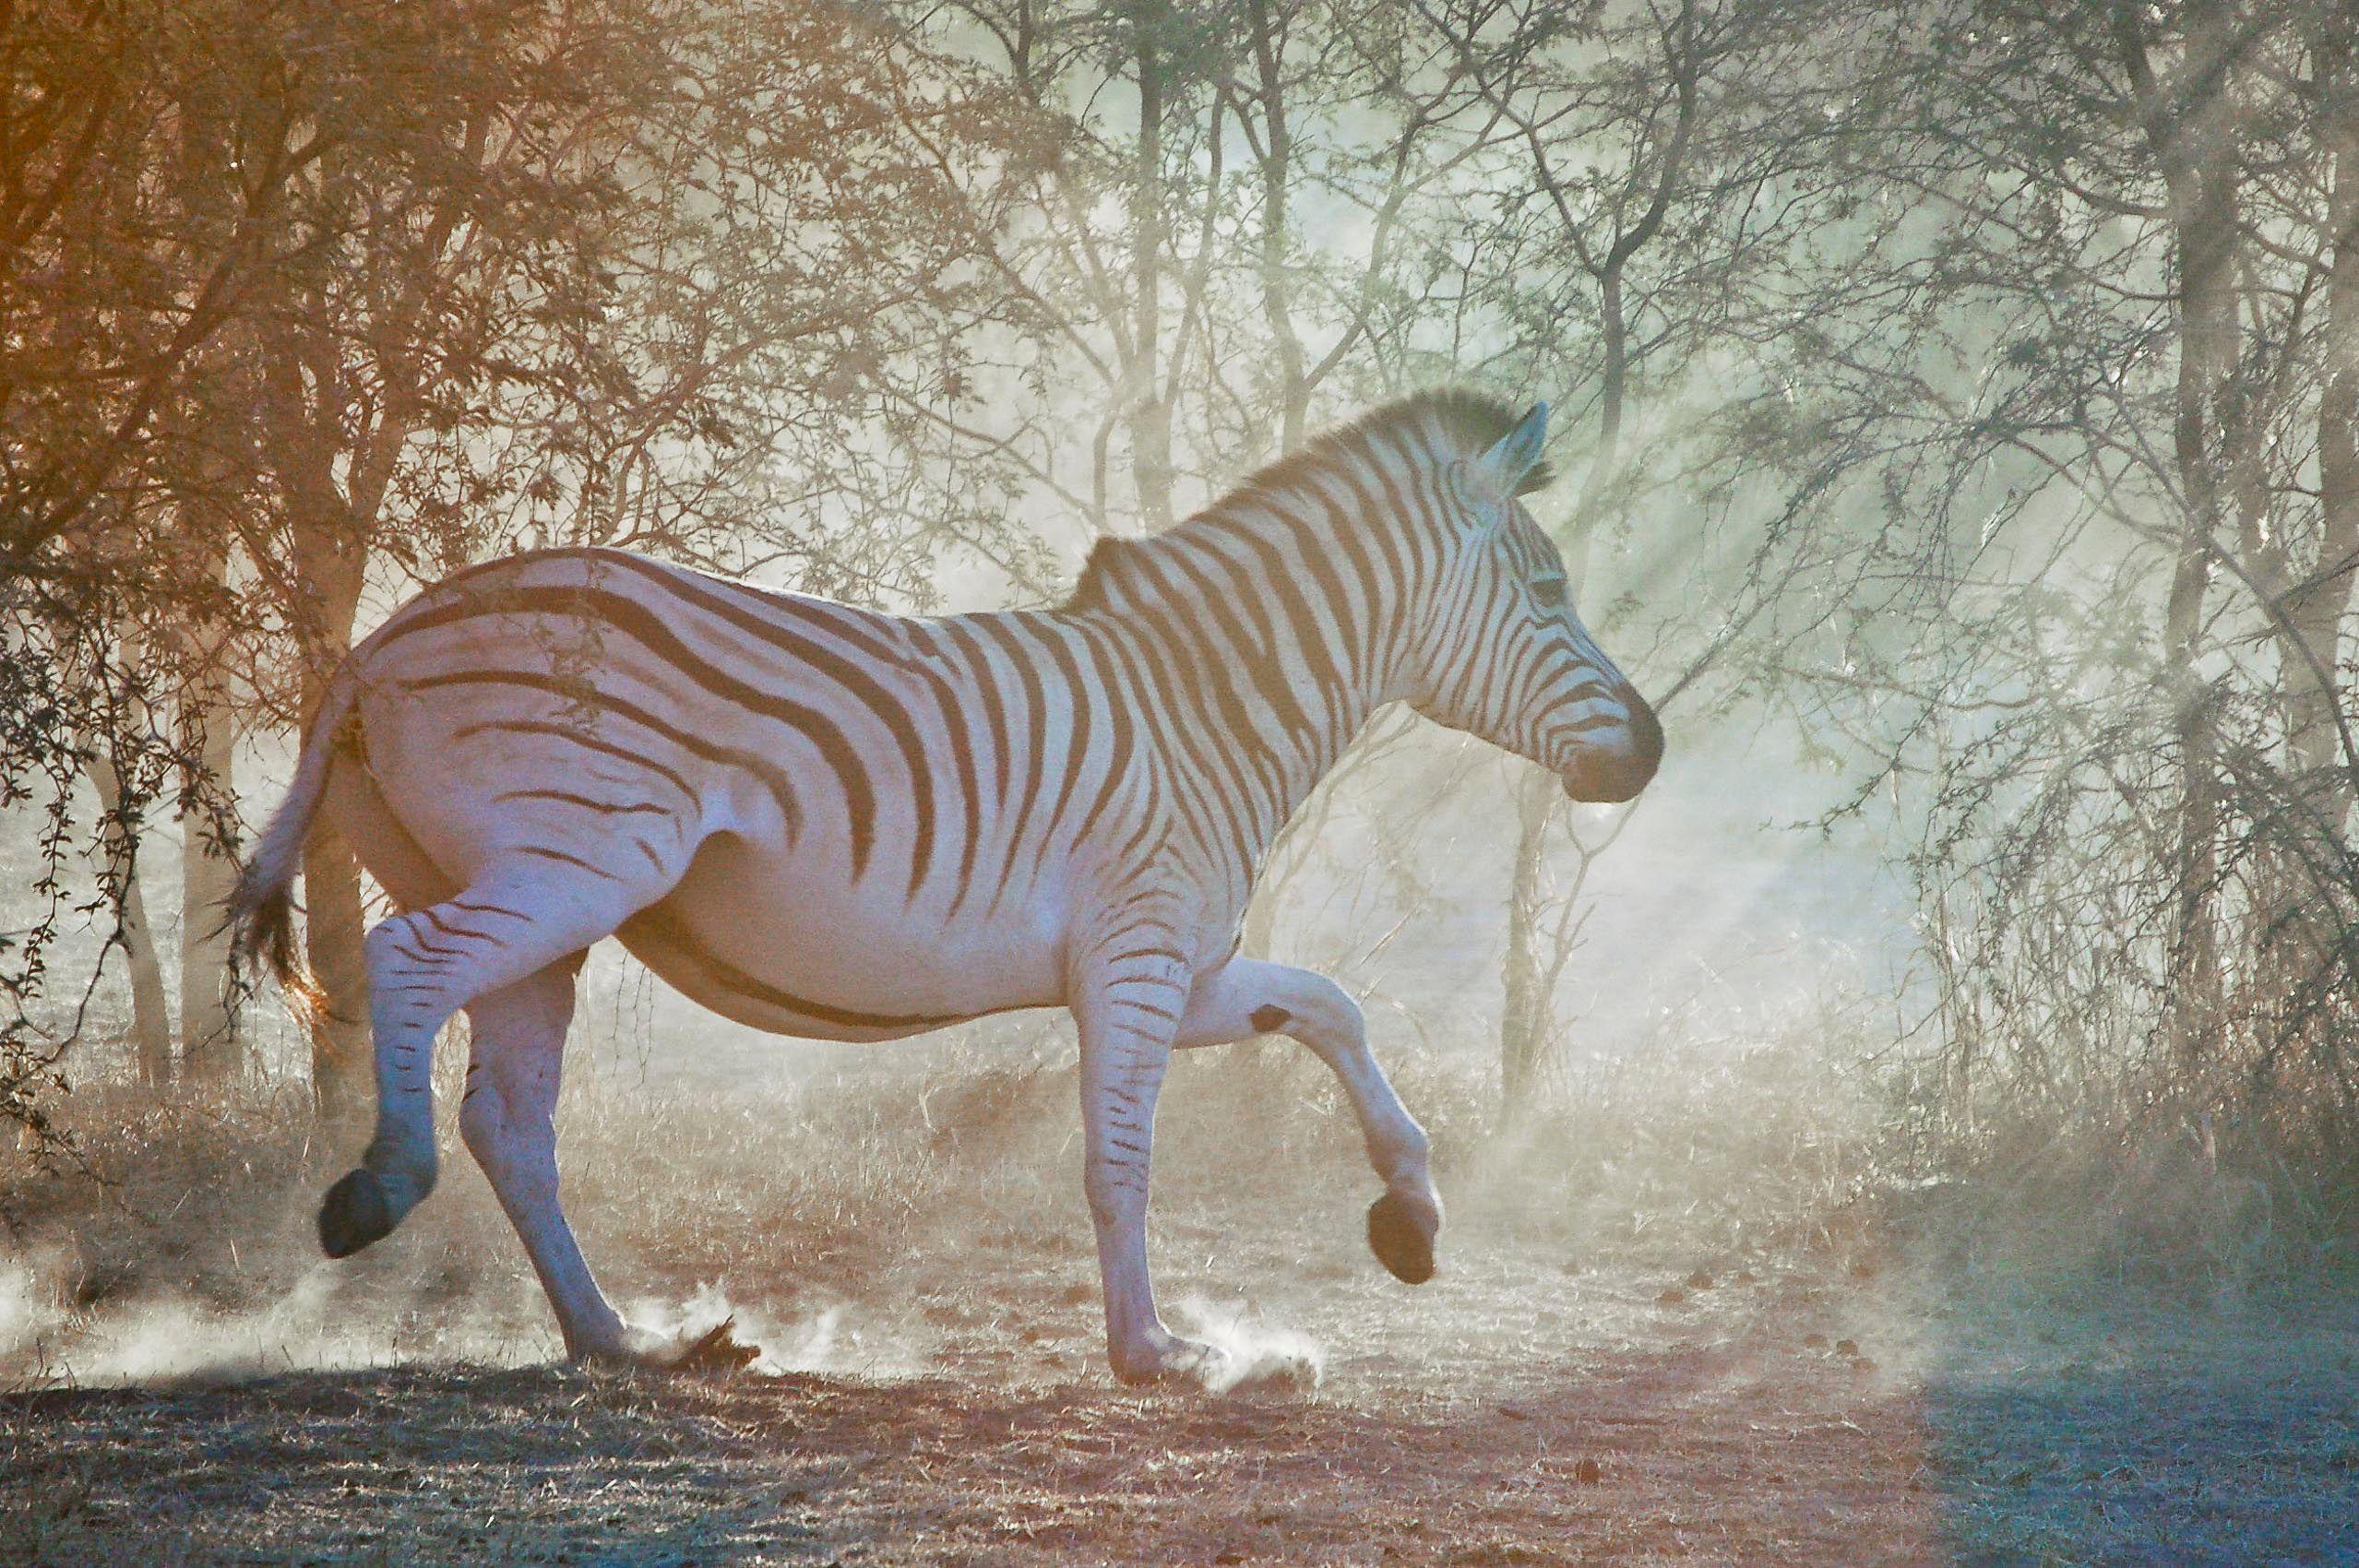 botswana_chobe_national_park_zebra_running.jpg